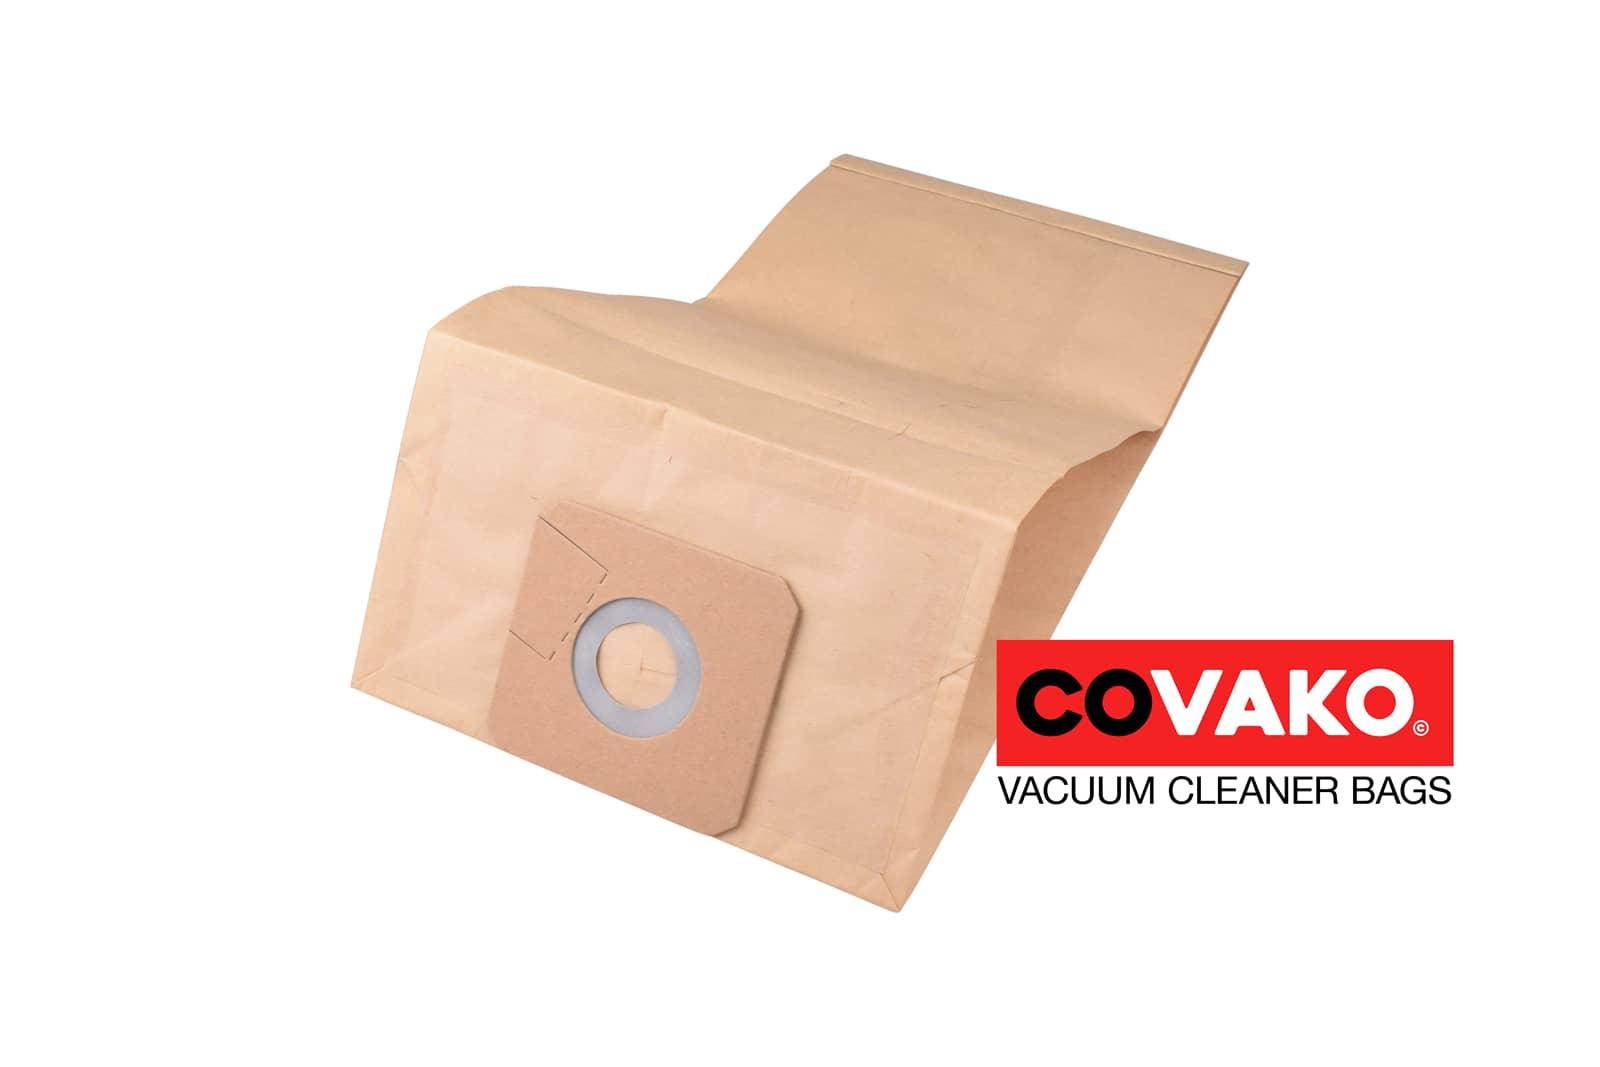 Kärcher T 12/1 / Papier - Kärcher sacs d'aspirateur